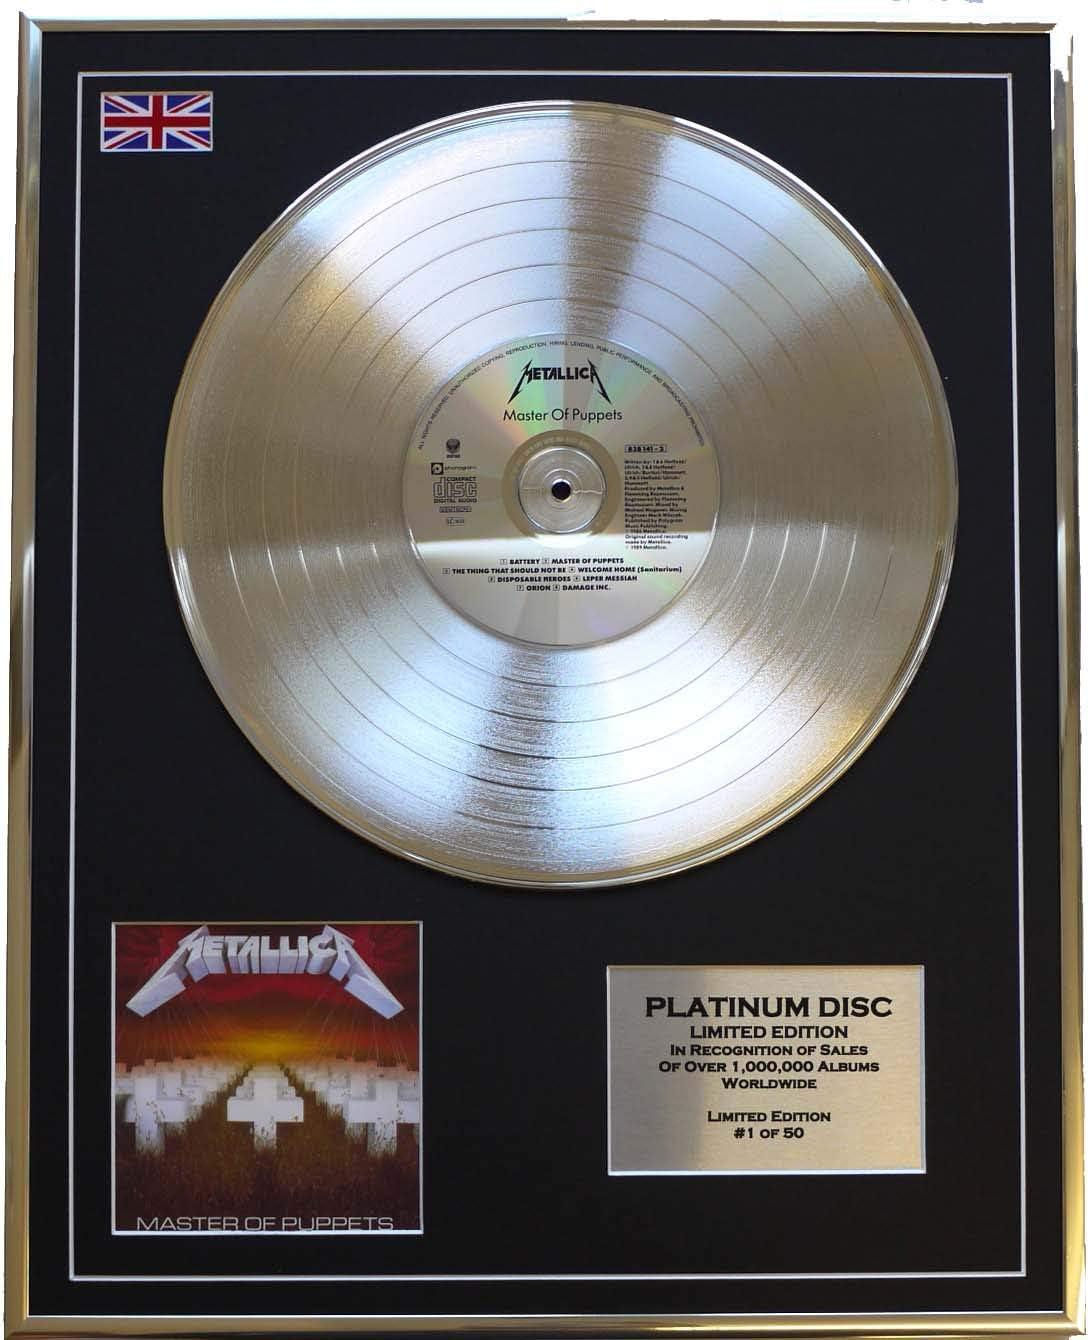 METALLICA/LTD Edicion CD platinum disc/MASTER OF PUPPETS: Amazon.es: Hogar